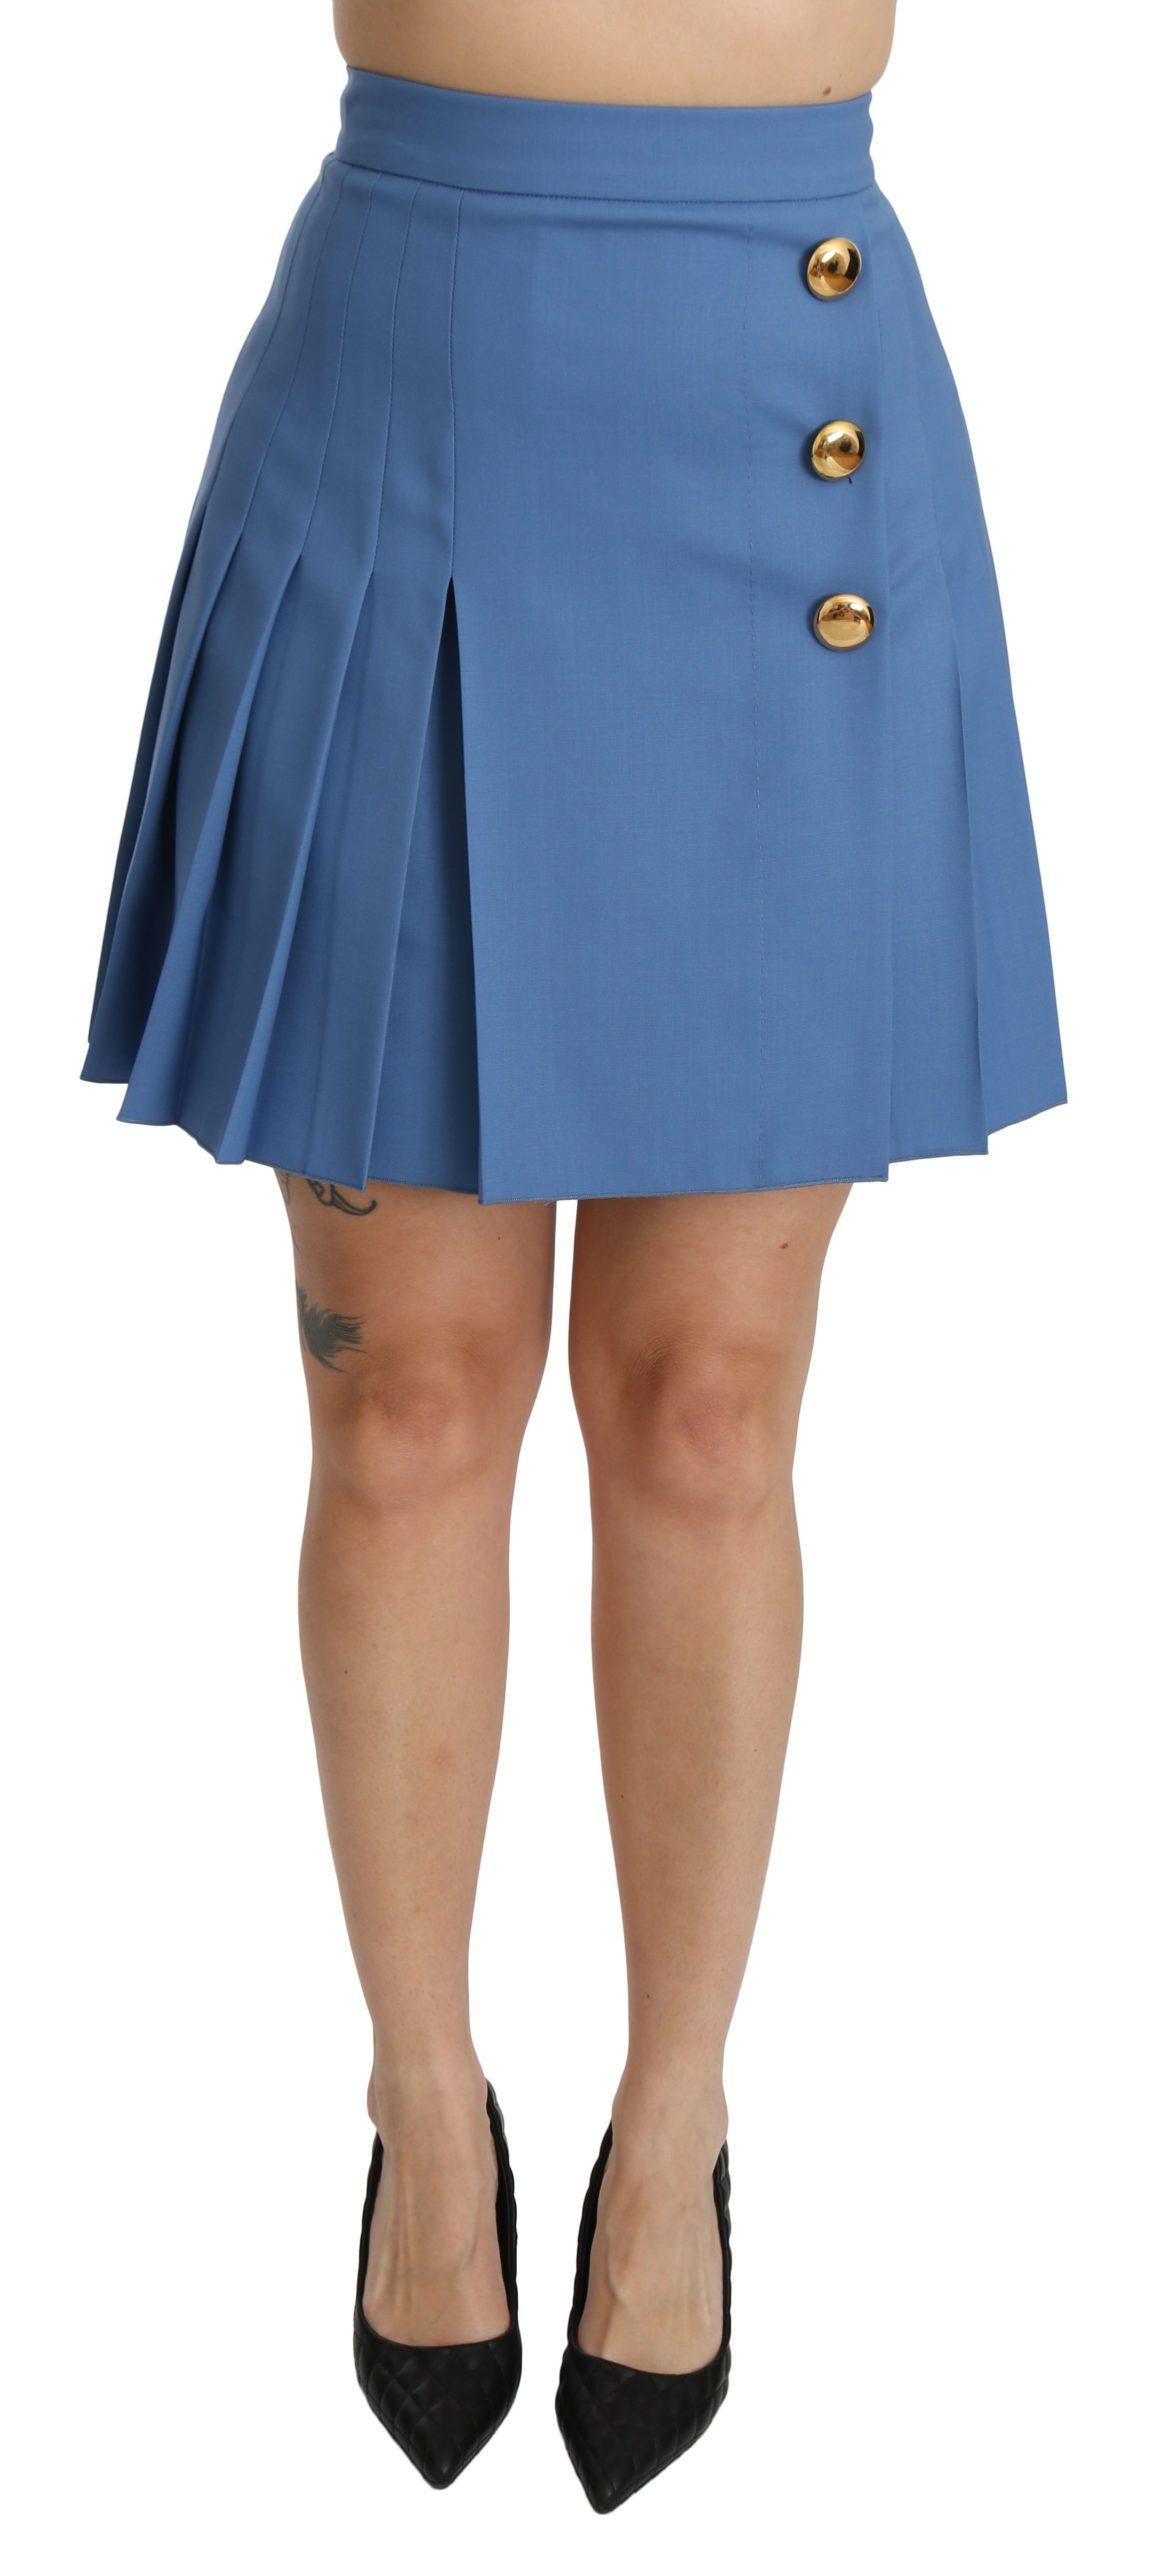 Dolce & Gabbana Women's Pleated High Waist Mini Wool Skirt Blue SKI1366 - IT36 | XS